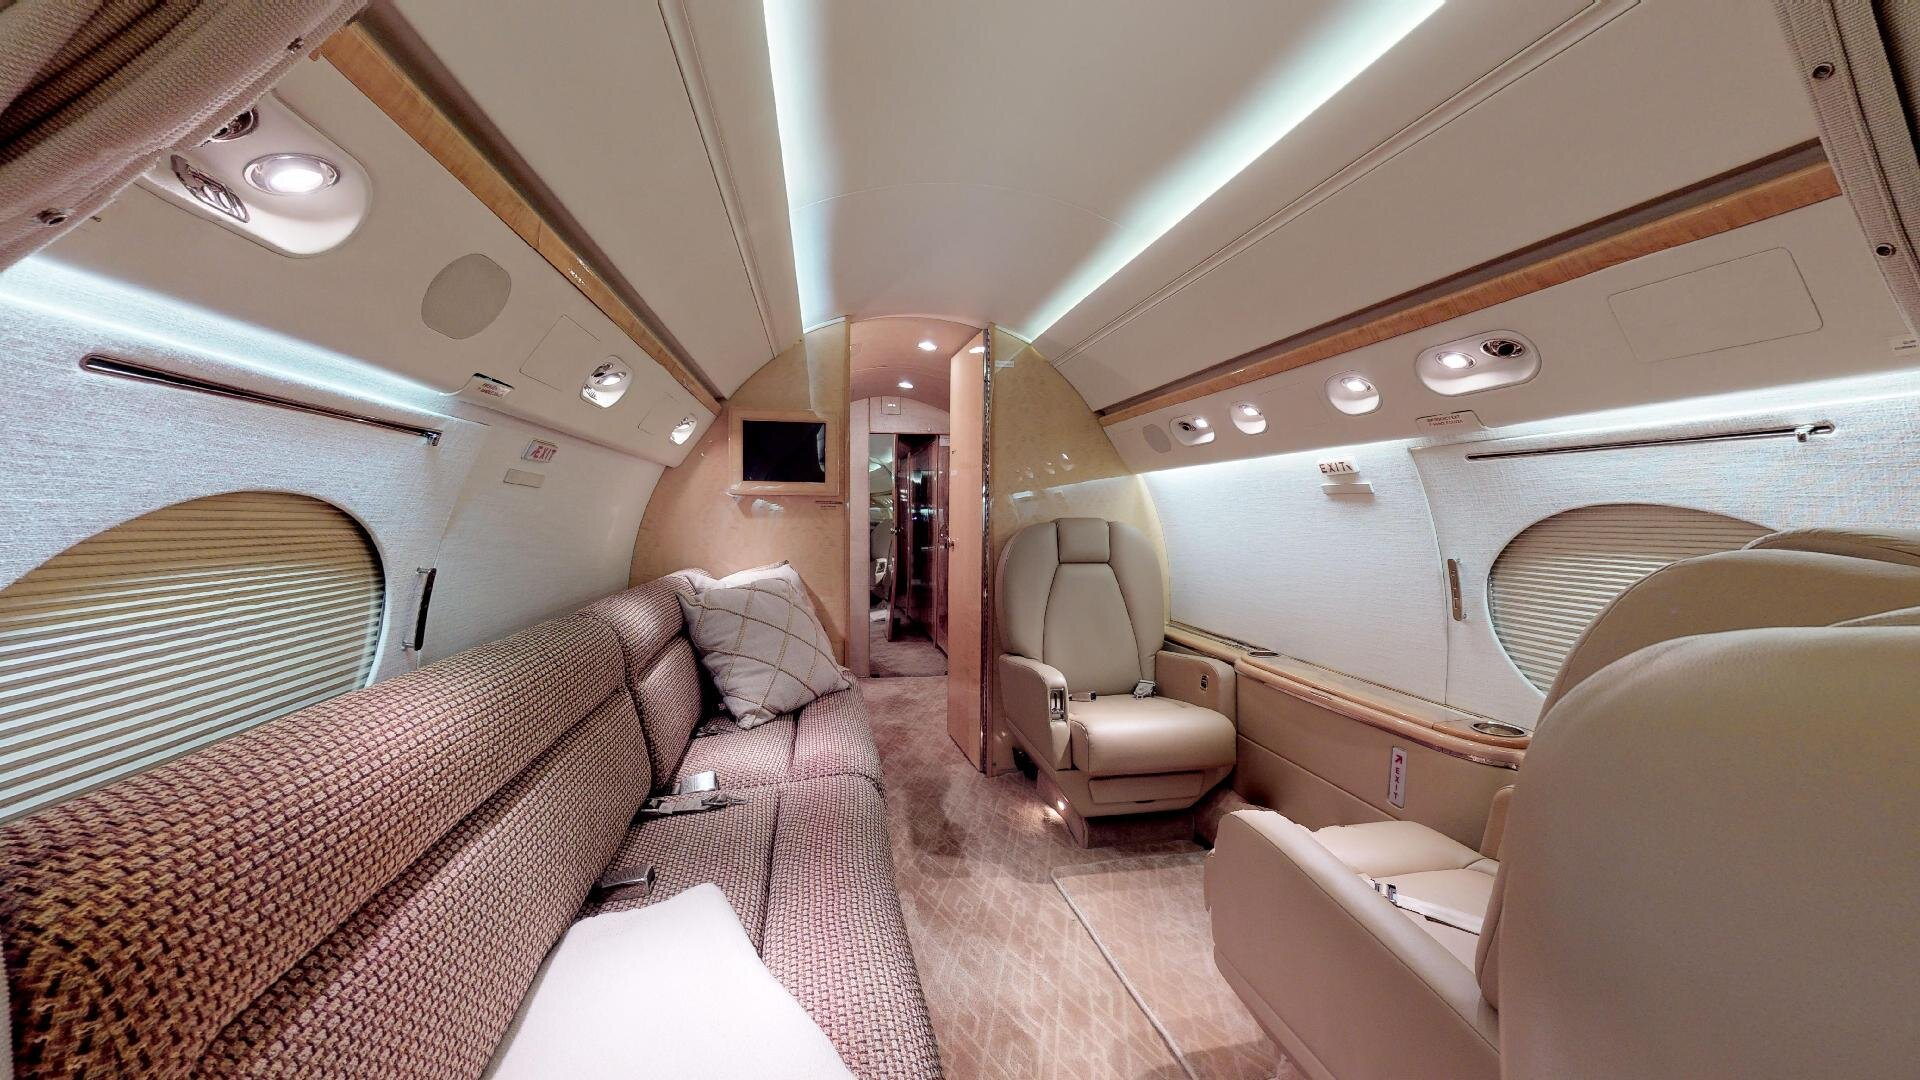 Gulfstream-V-SN-518-09232019_132009.jpg